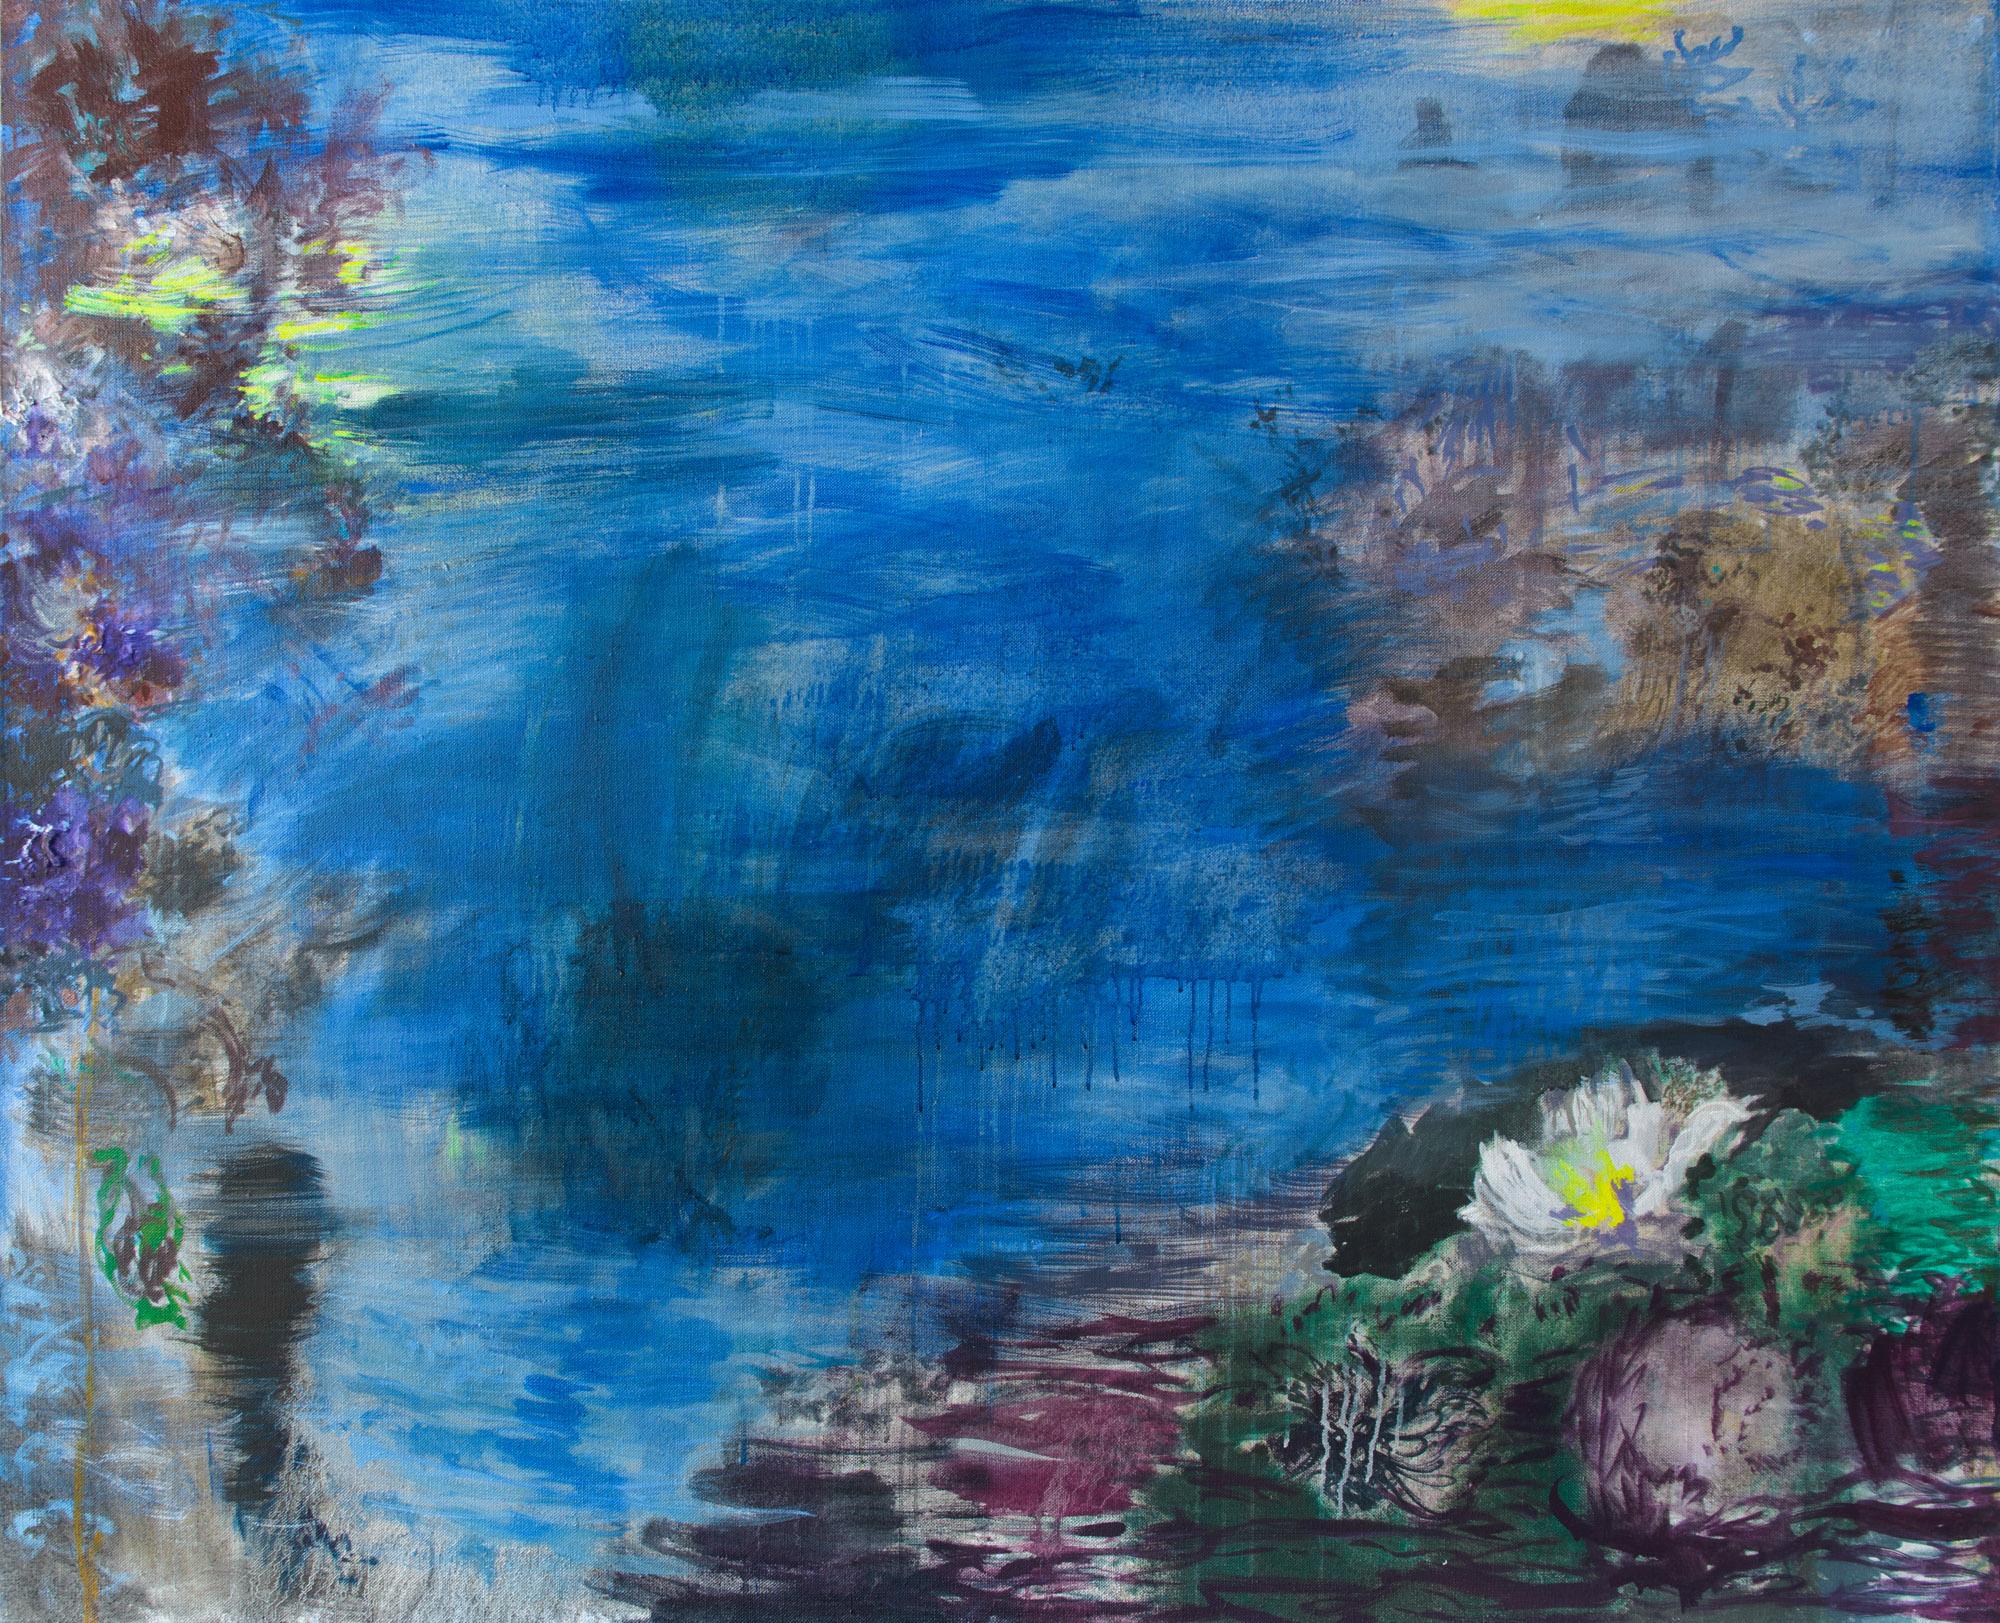 Marjukka Paunila: Nazaré, 130x160 cm, tempera, 2017